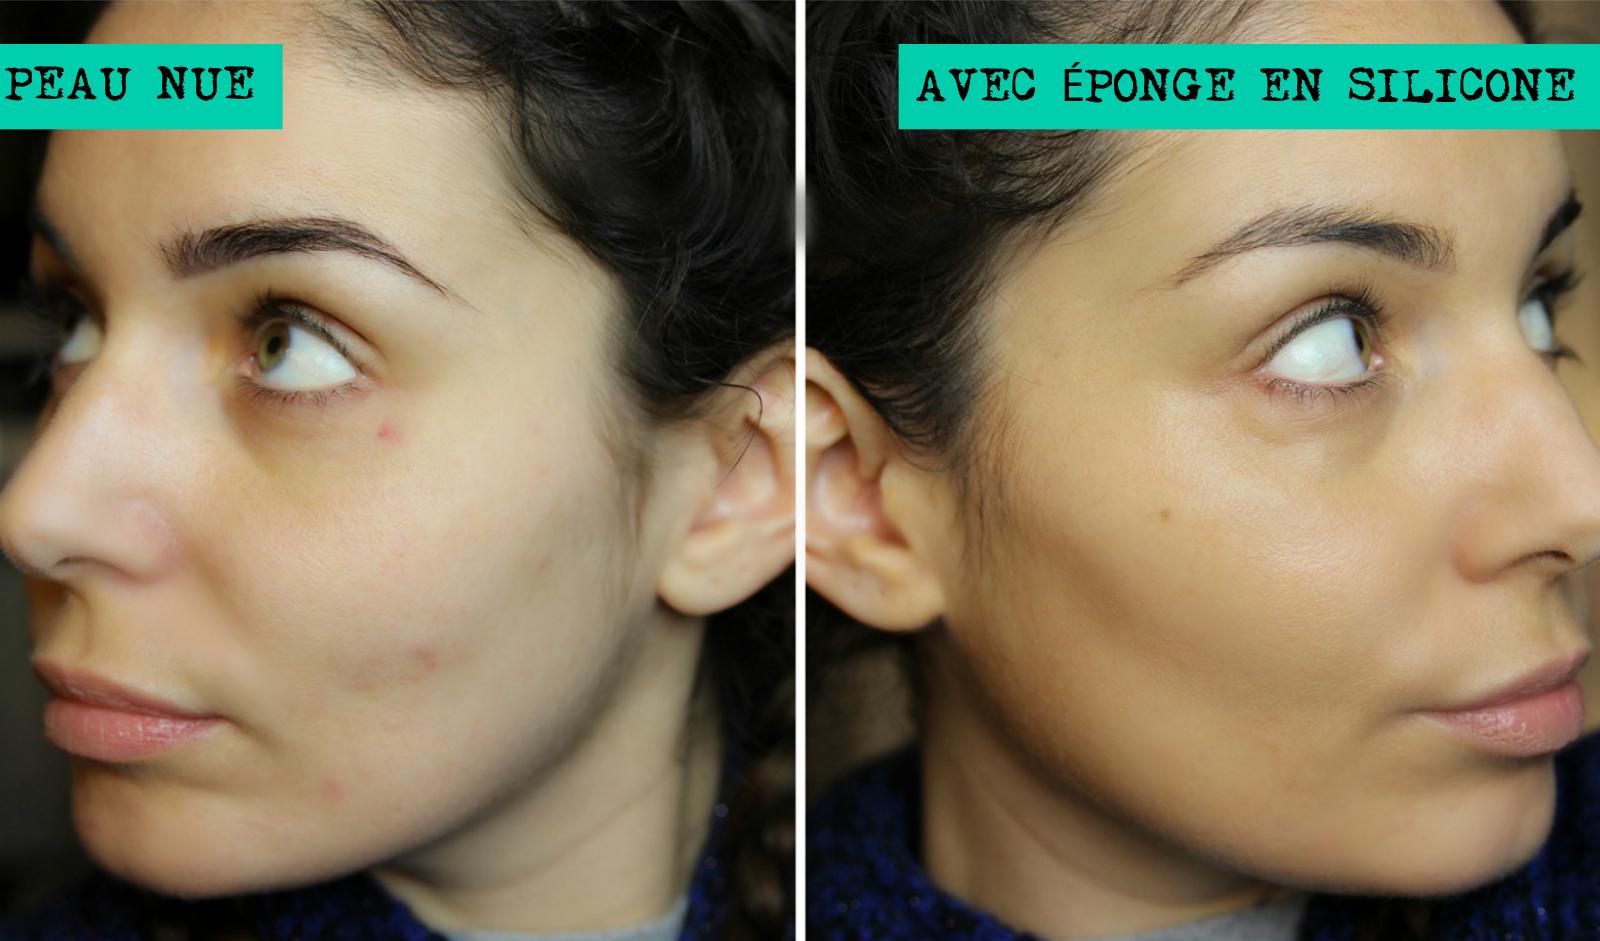 Eponge-silicone-silidrop-maquillage-1